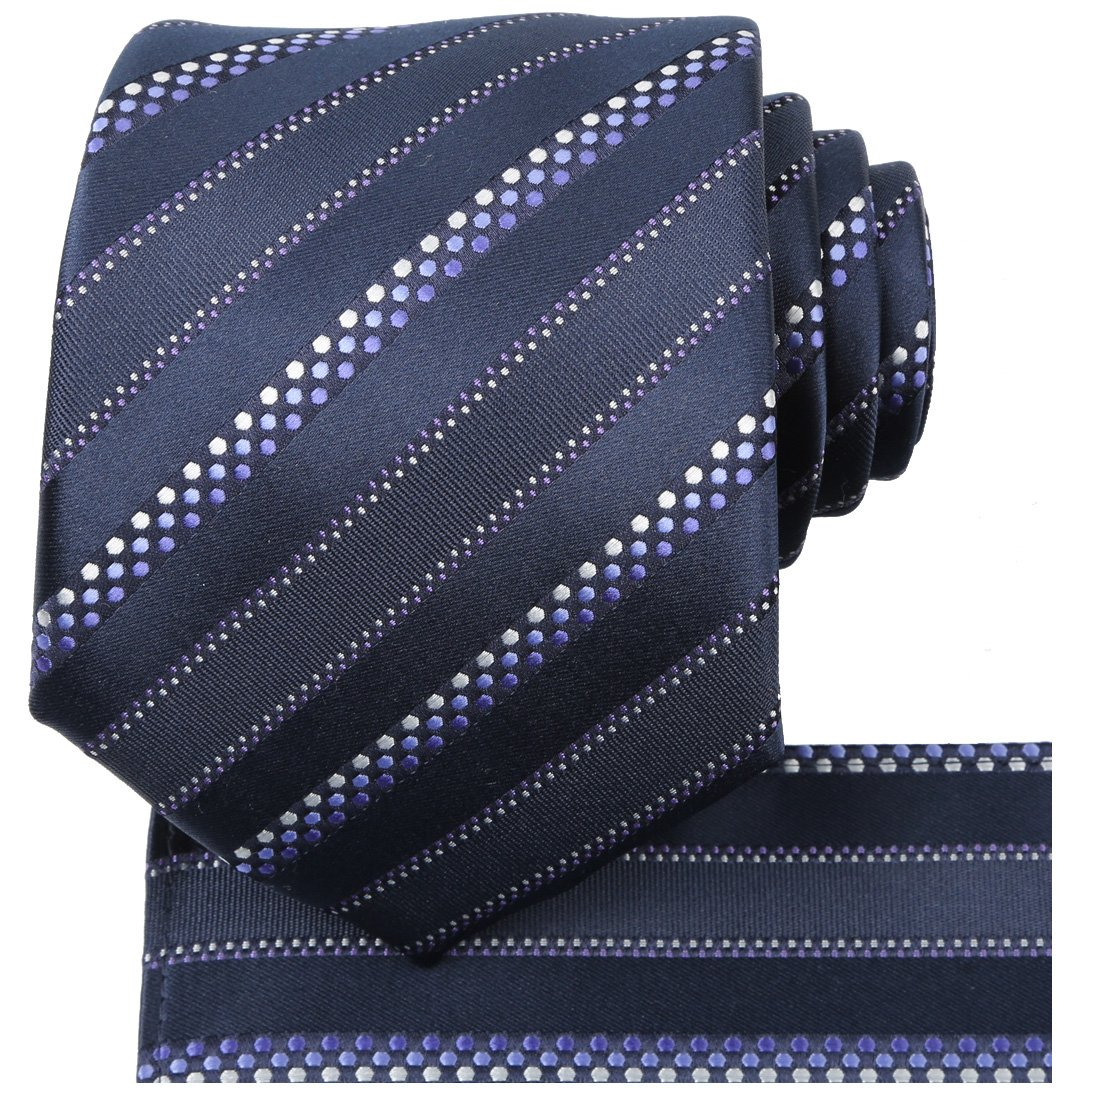 KissTies Men's Tie Set Striped Necktie + Hanky + Gift Box Buttercup Yellow KT0017-A